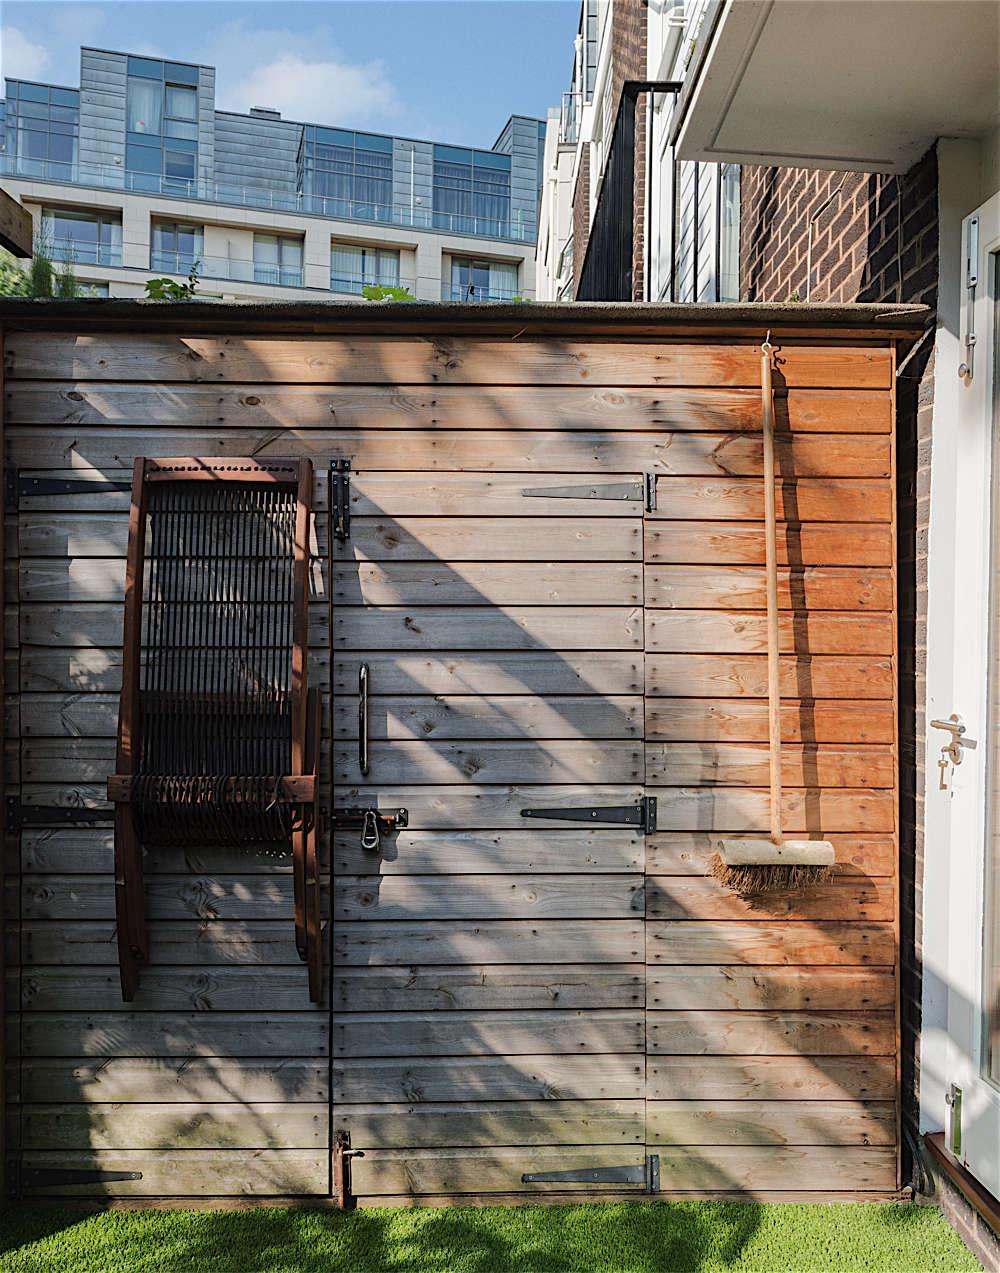 Christine Chang Hanway, London garden, Garden as exterior room, artificial grass, outdoor seating, garden shed, Matthew Williams | Gardenista